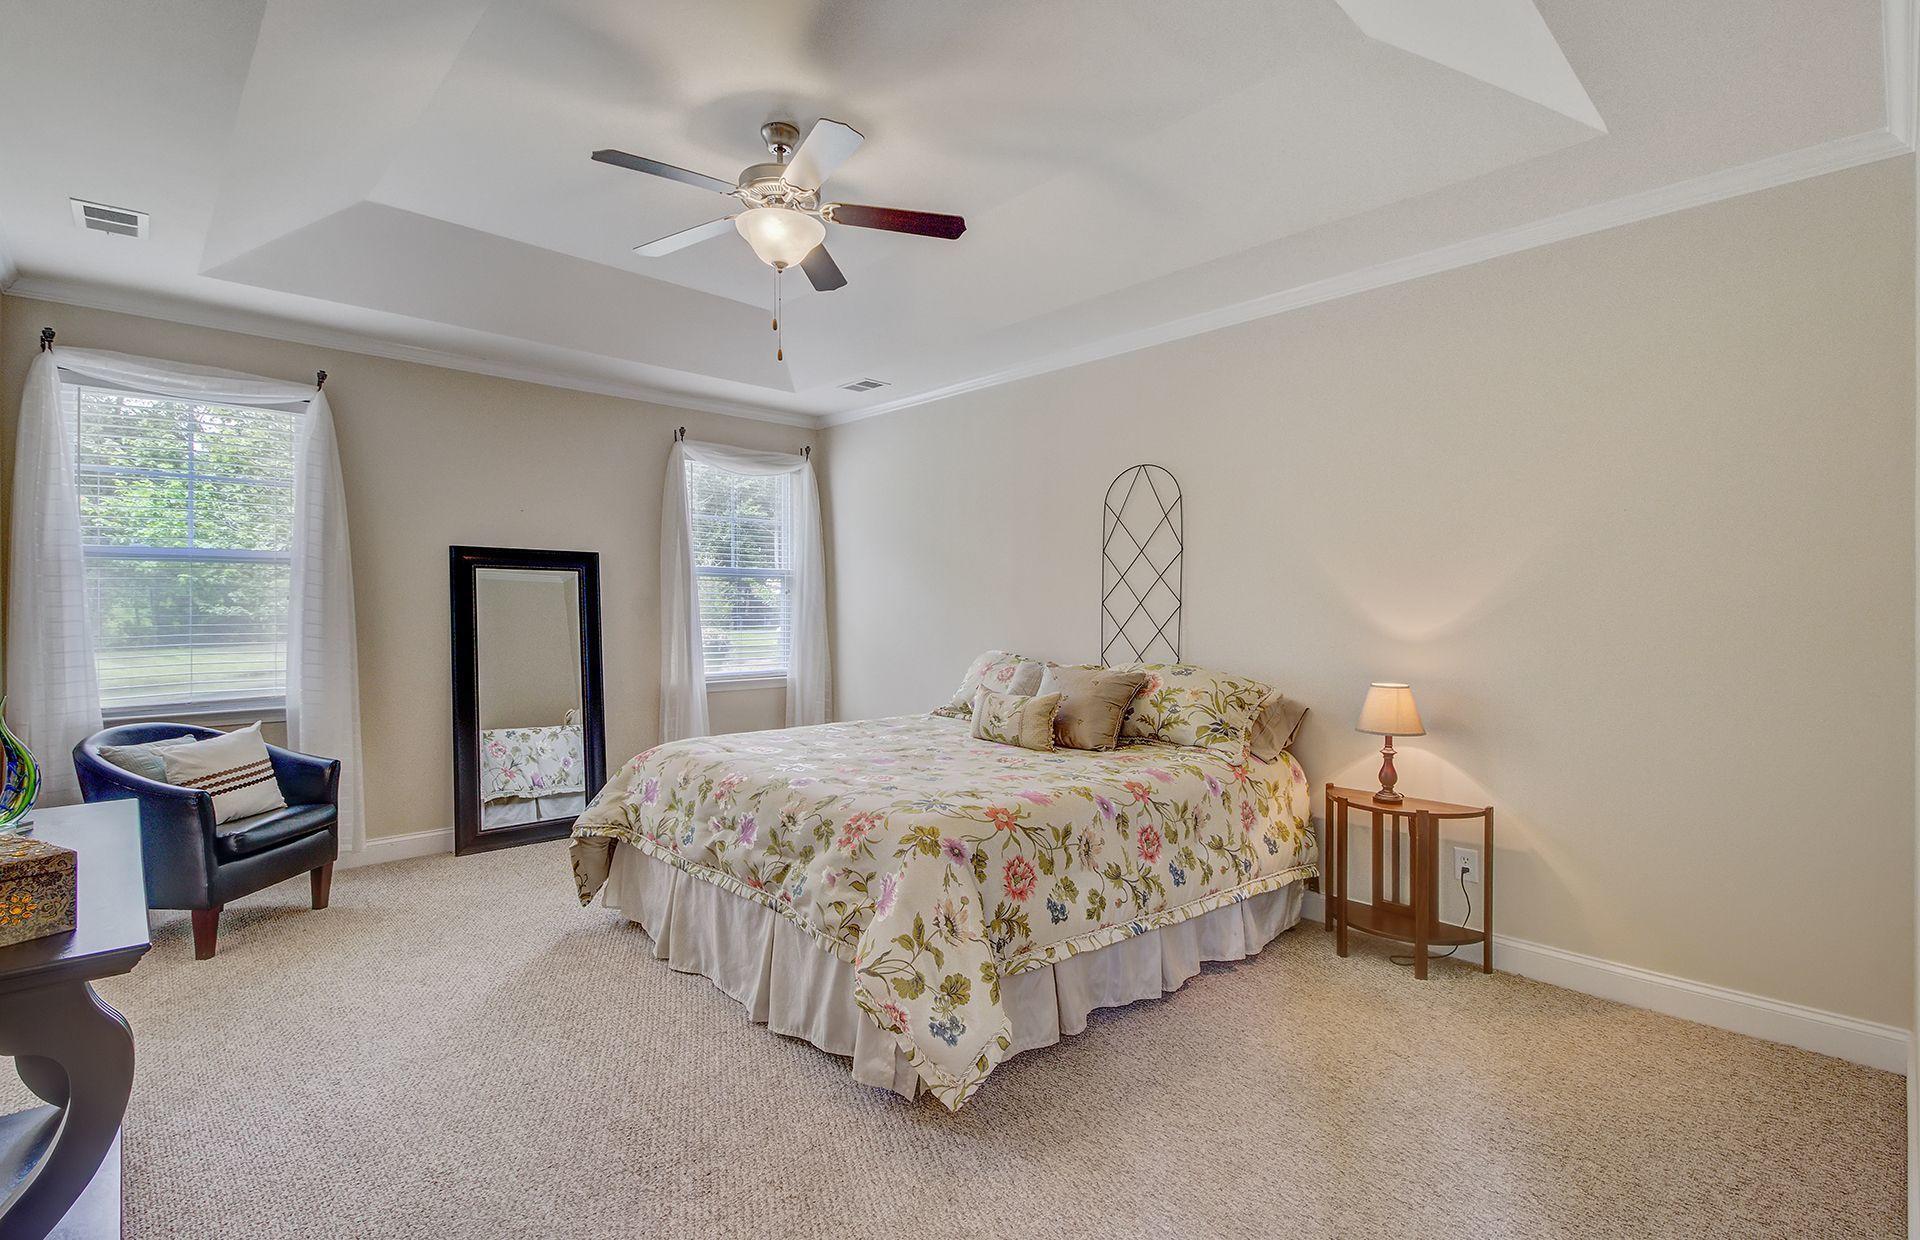 Linnen Place Homes For Sale - 1275 Shingleback, Mount Pleasant, SC - 25